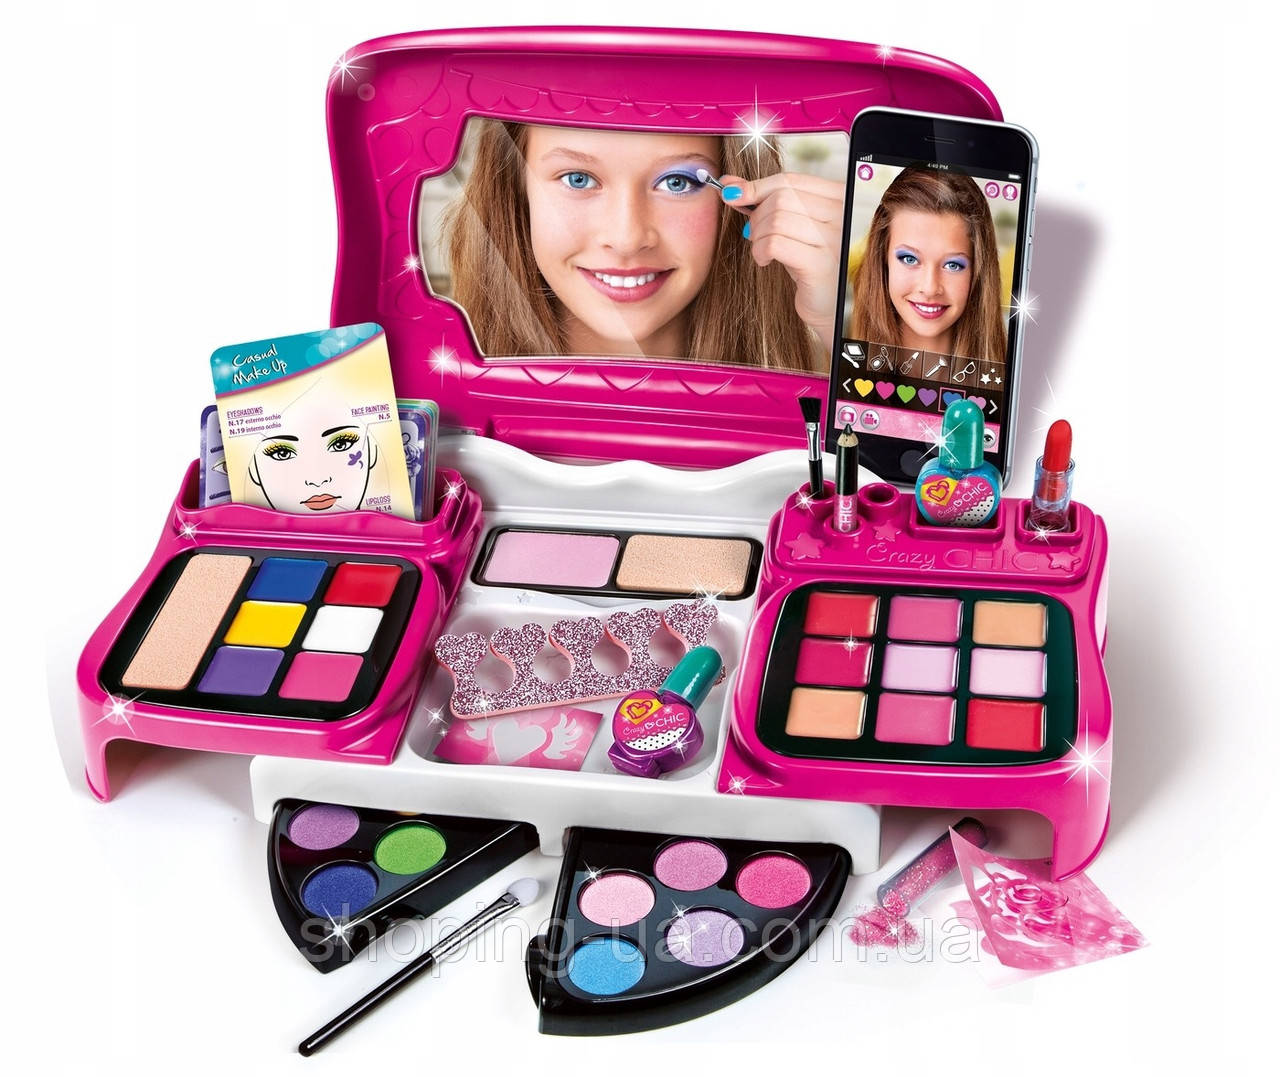 Детская косметика Crazy Chic Clementoni 78293